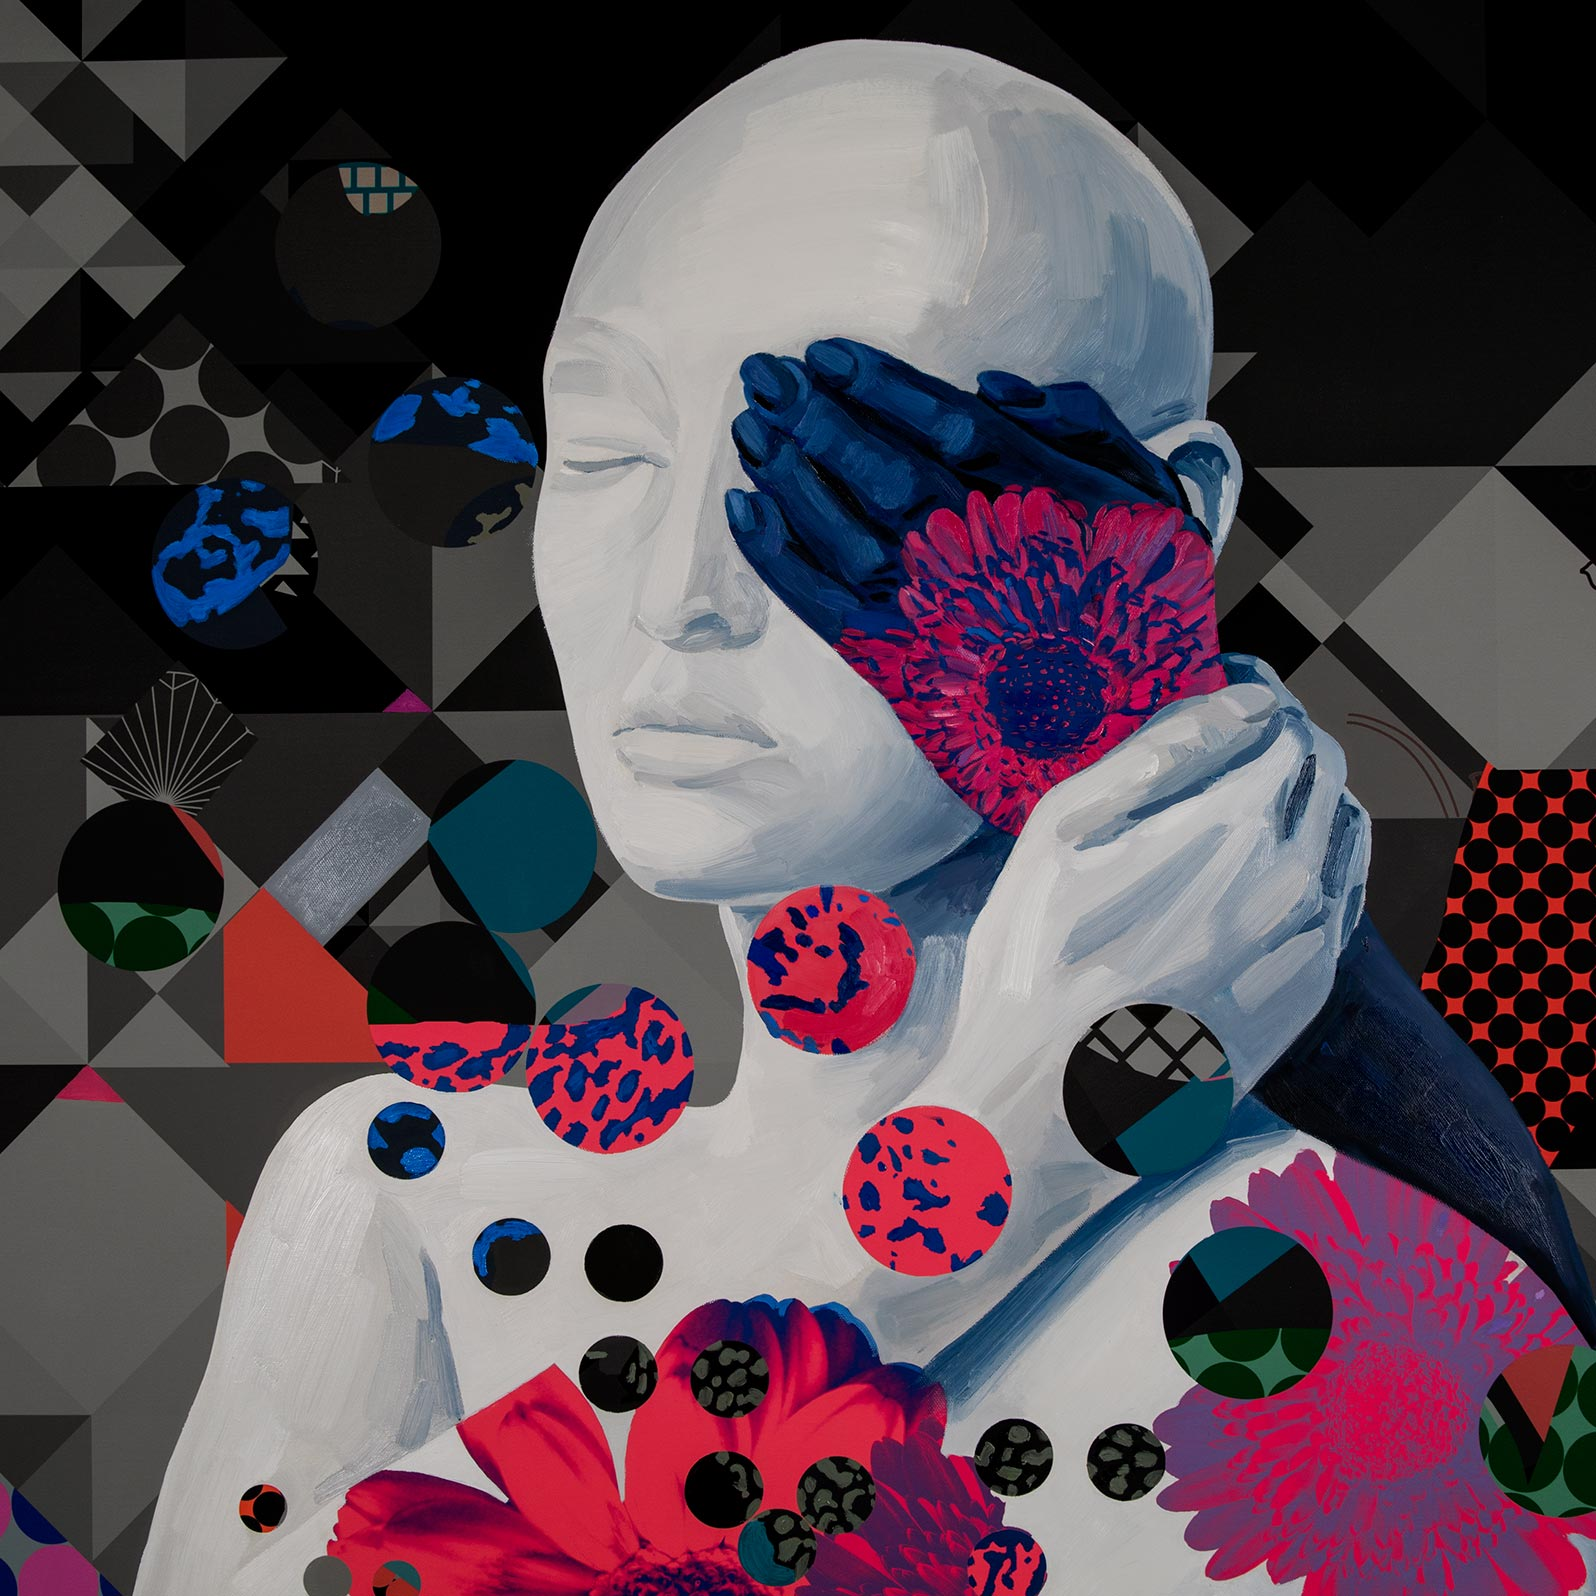 Anca Stefanescu   Contemporary Creative Painter, AnotherPortionOfSelf